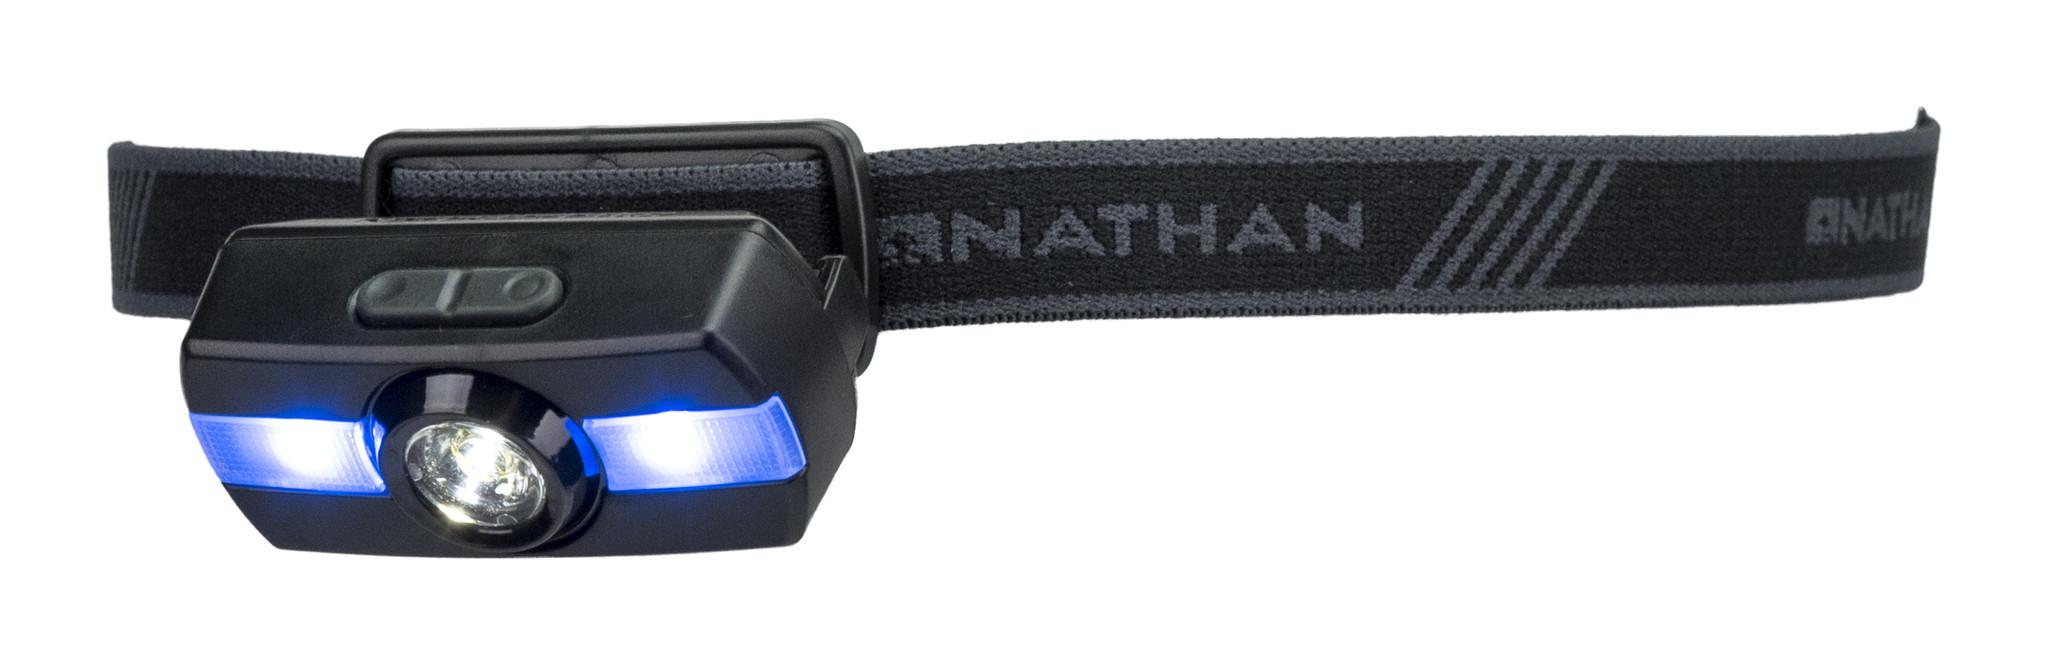 Nathan Nathan Neutron Fire Headlamp, Black